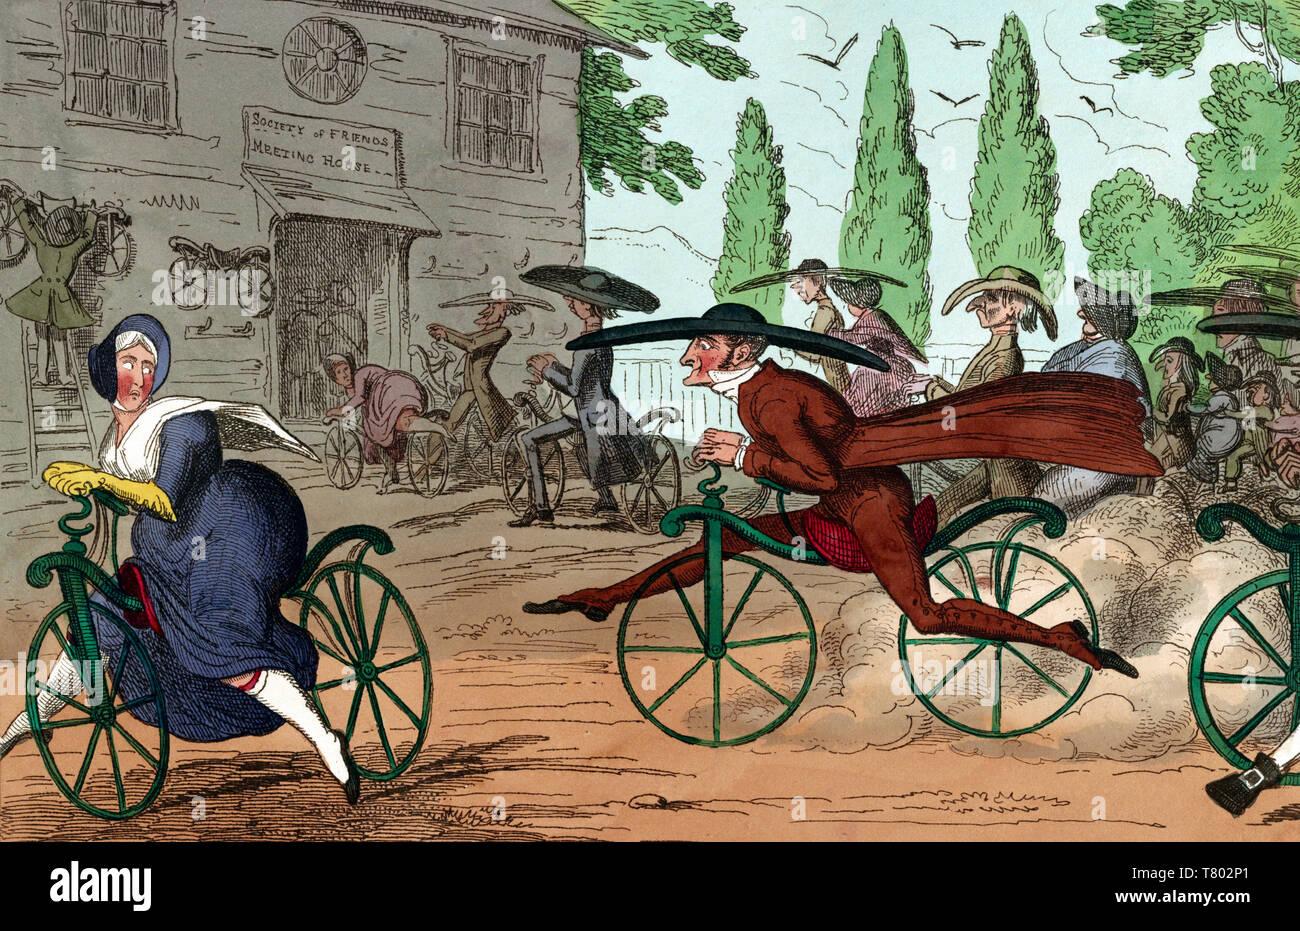 Quakers Riding Dandy Horses, 1819 - Stock Image